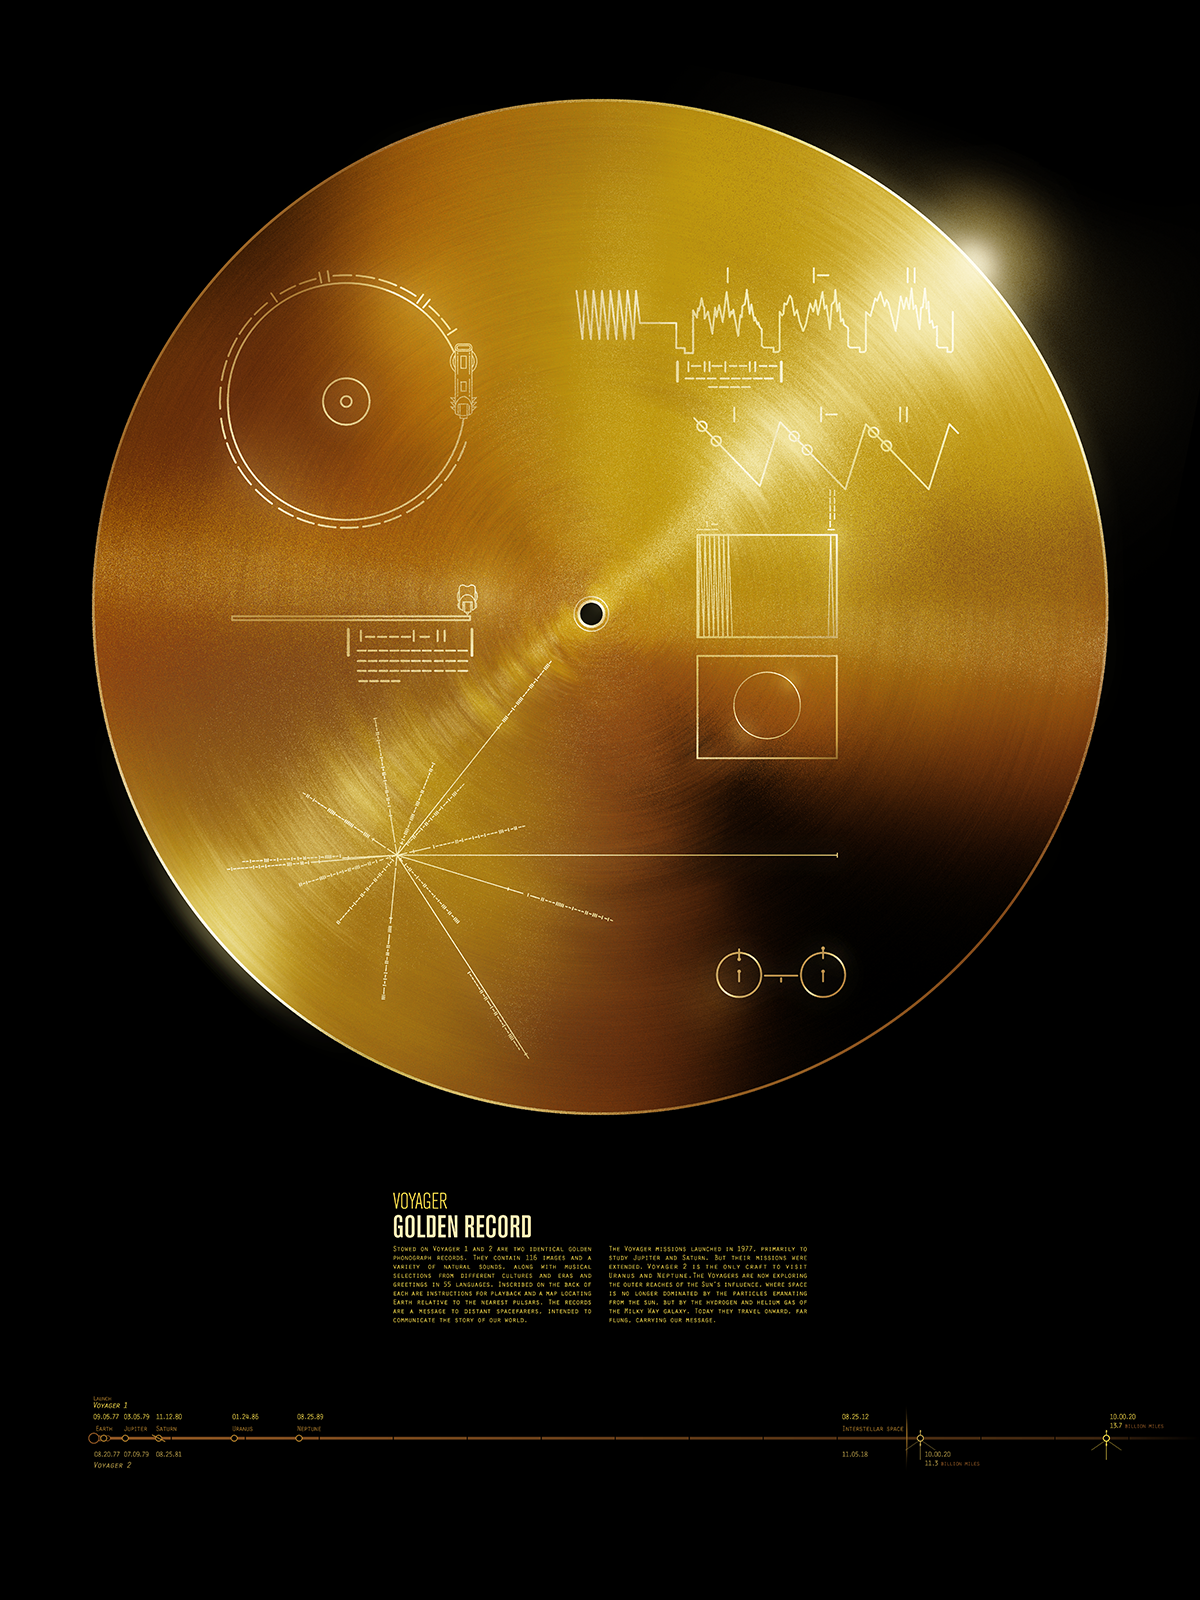 Voyager Golden Record Cedar Carbon Prints Voyager Golden Record Art Prints